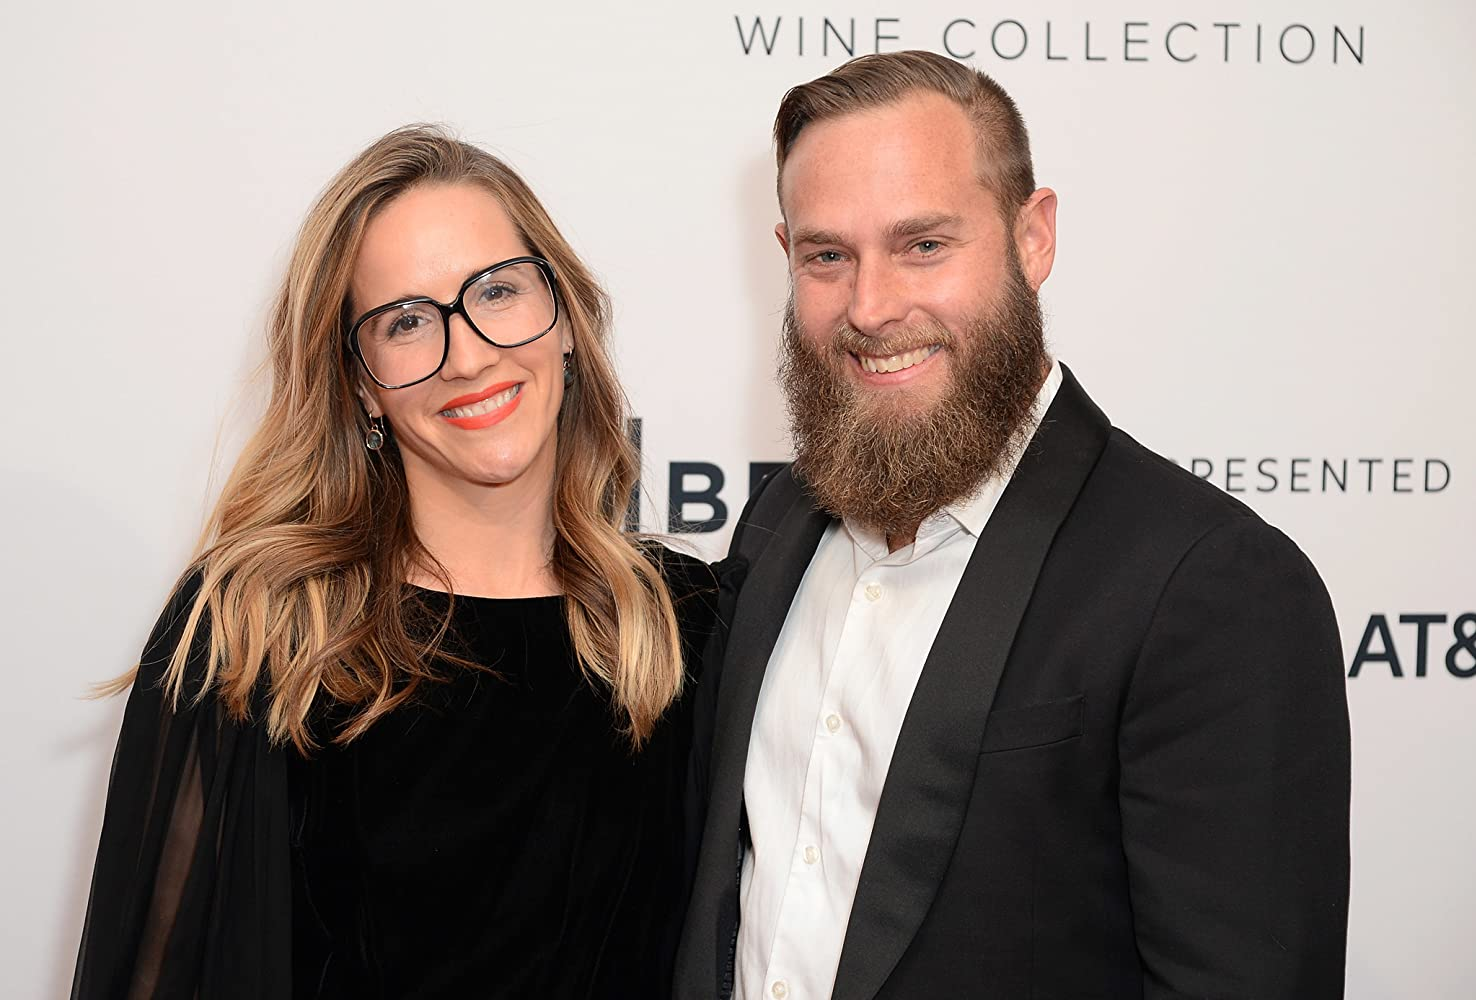 Jake Burghart and Meredith Danluck